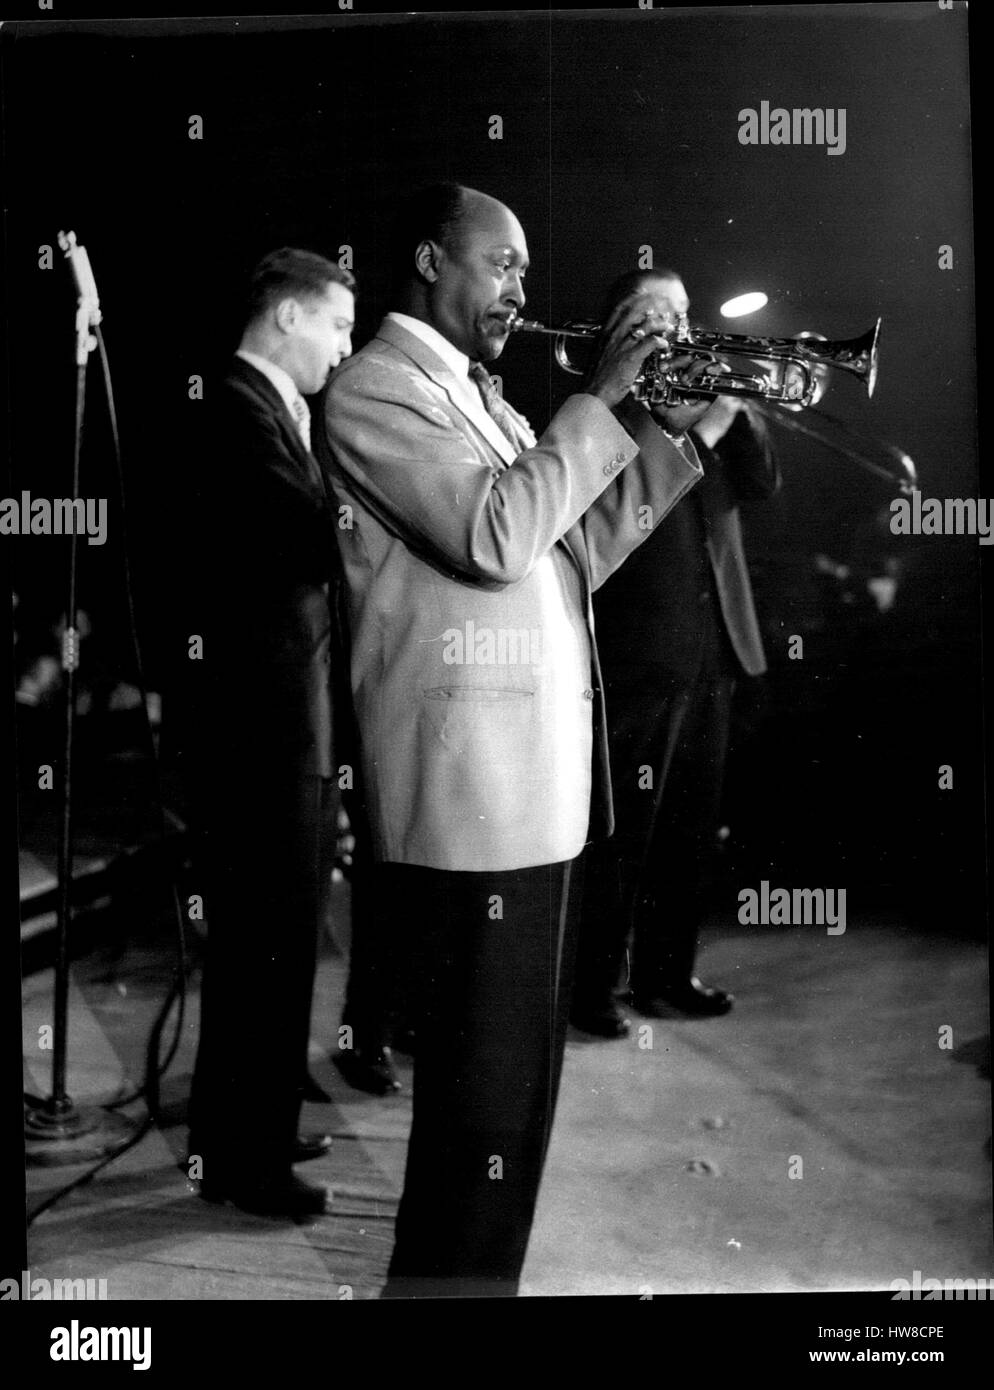 1968 - L'orchestre Rene France. NPM: Ala Trompette Bill Coleman. Credit: Keystone Pictures USA/ZUMAPRESS.com/Alamy - Stock Image